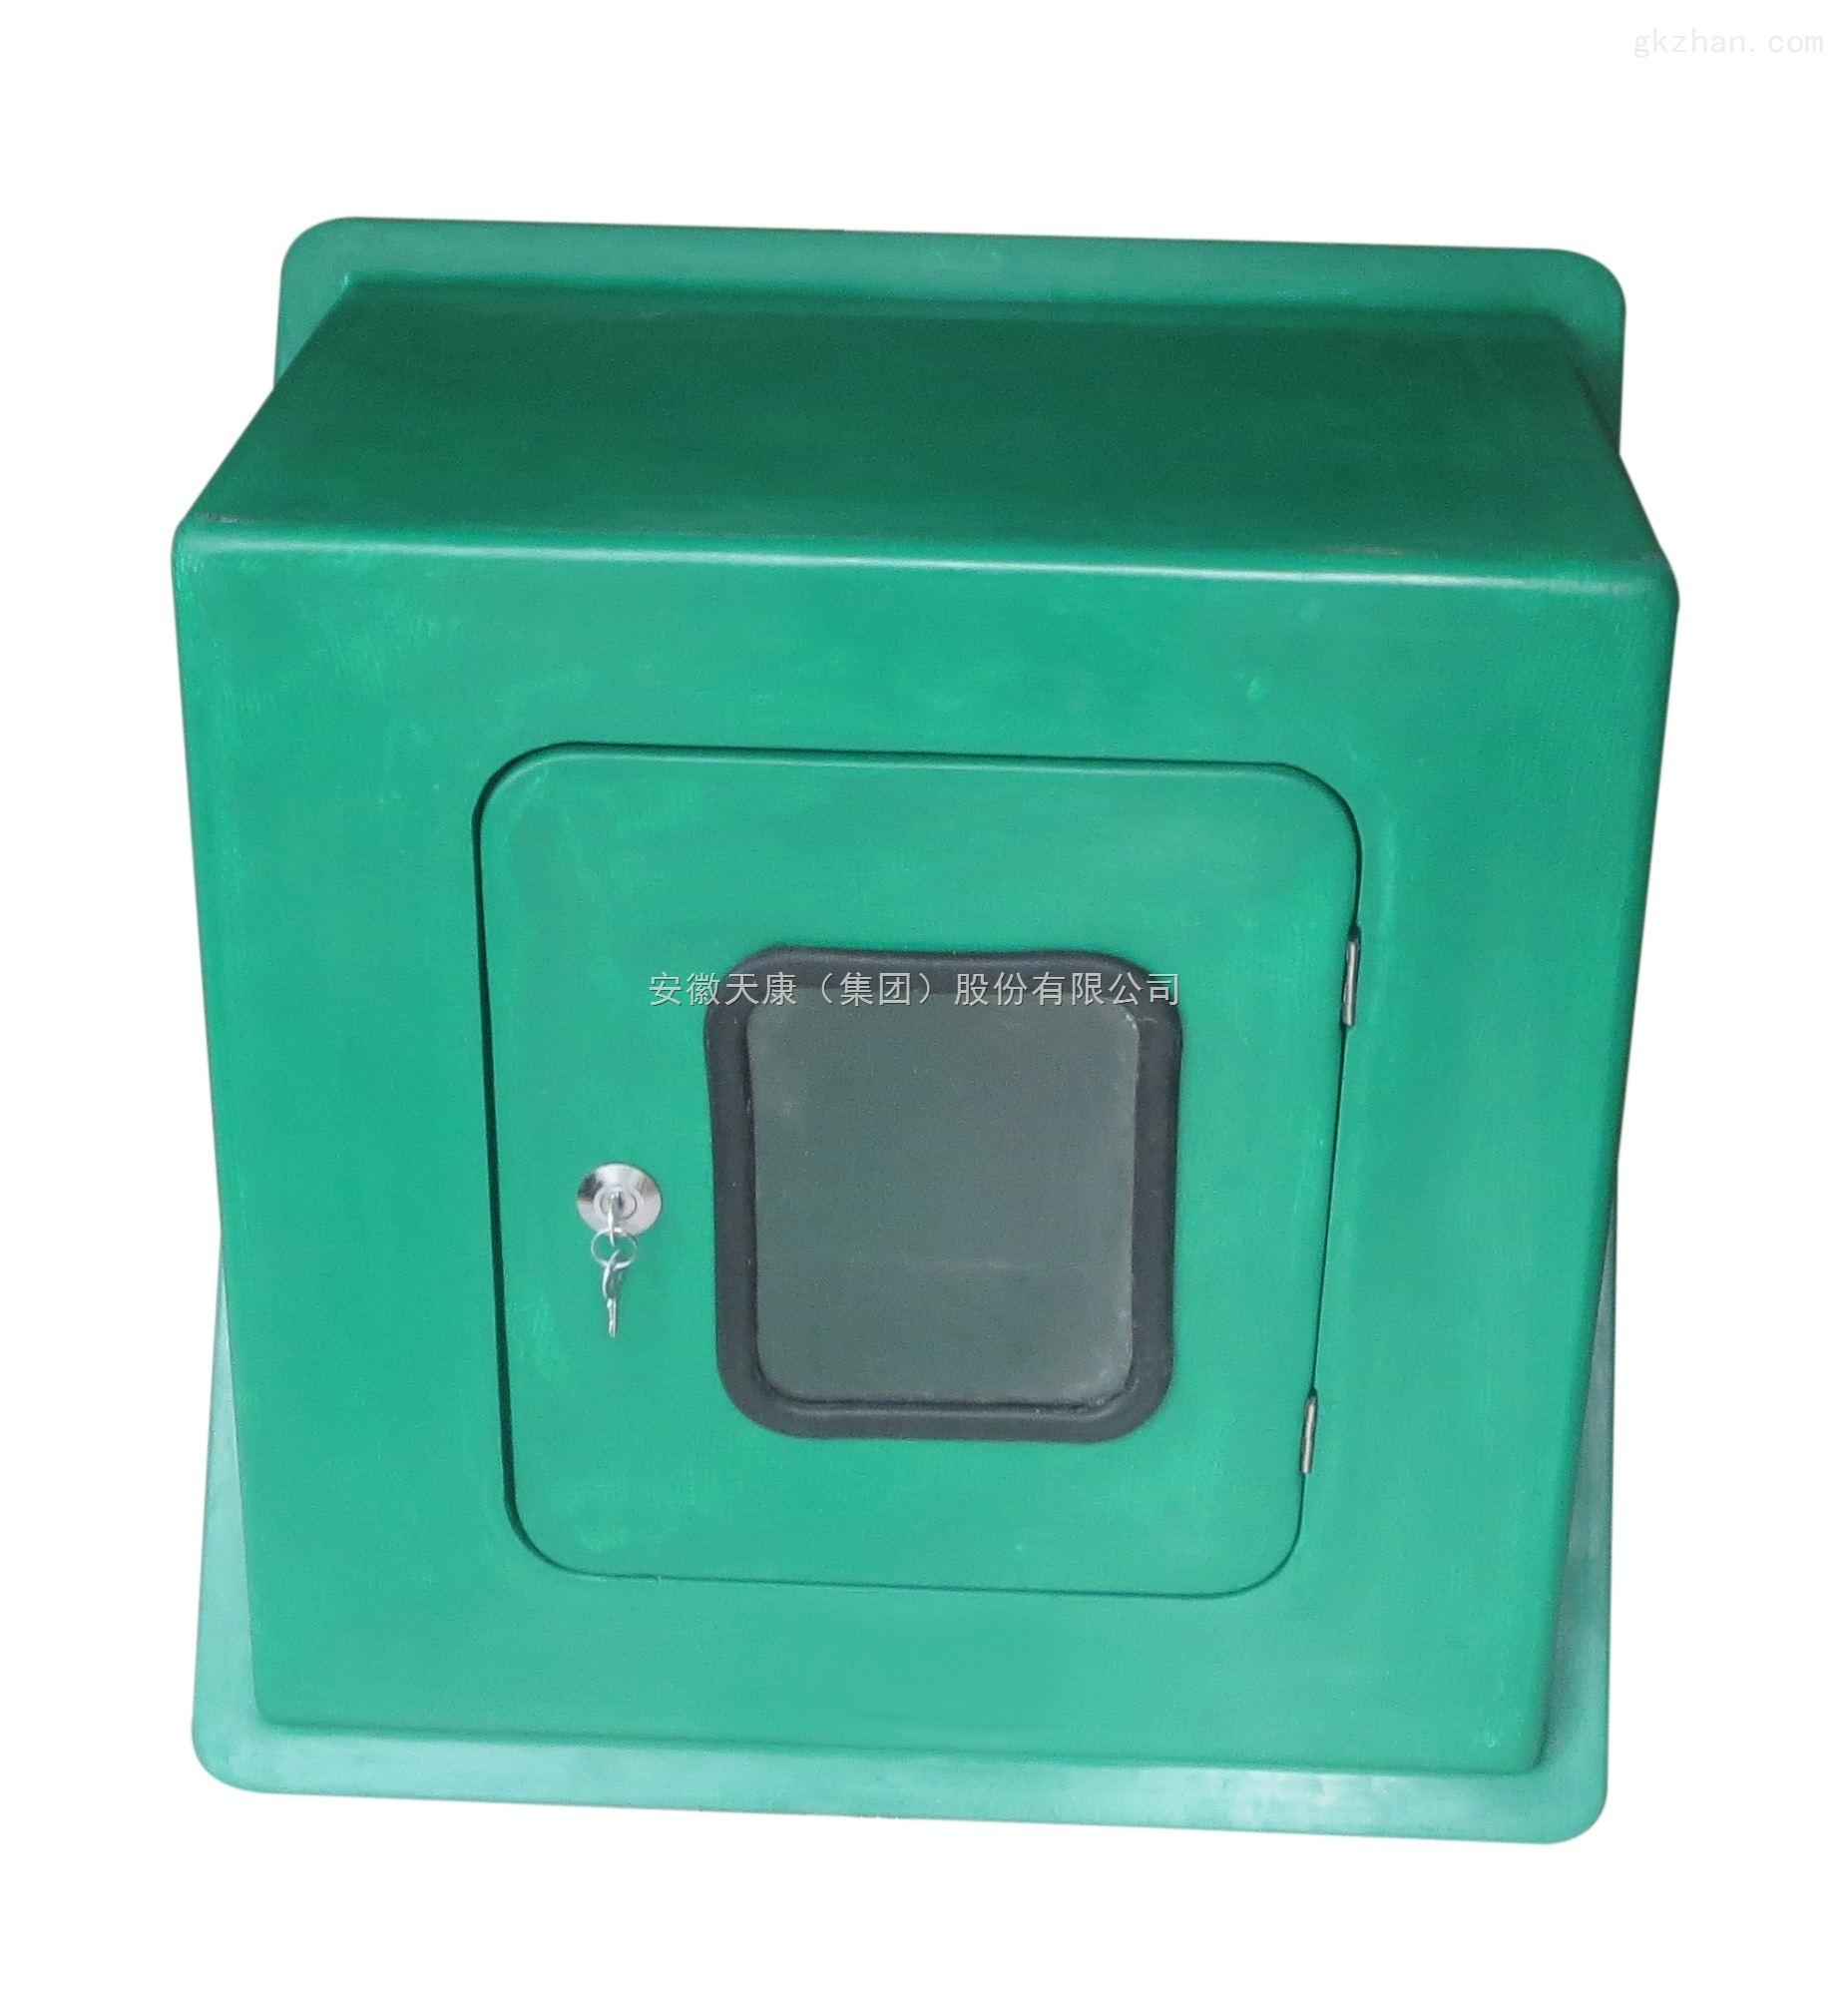 YXH-654E仪表保护箱玻璃钢防腐防火防尘箱